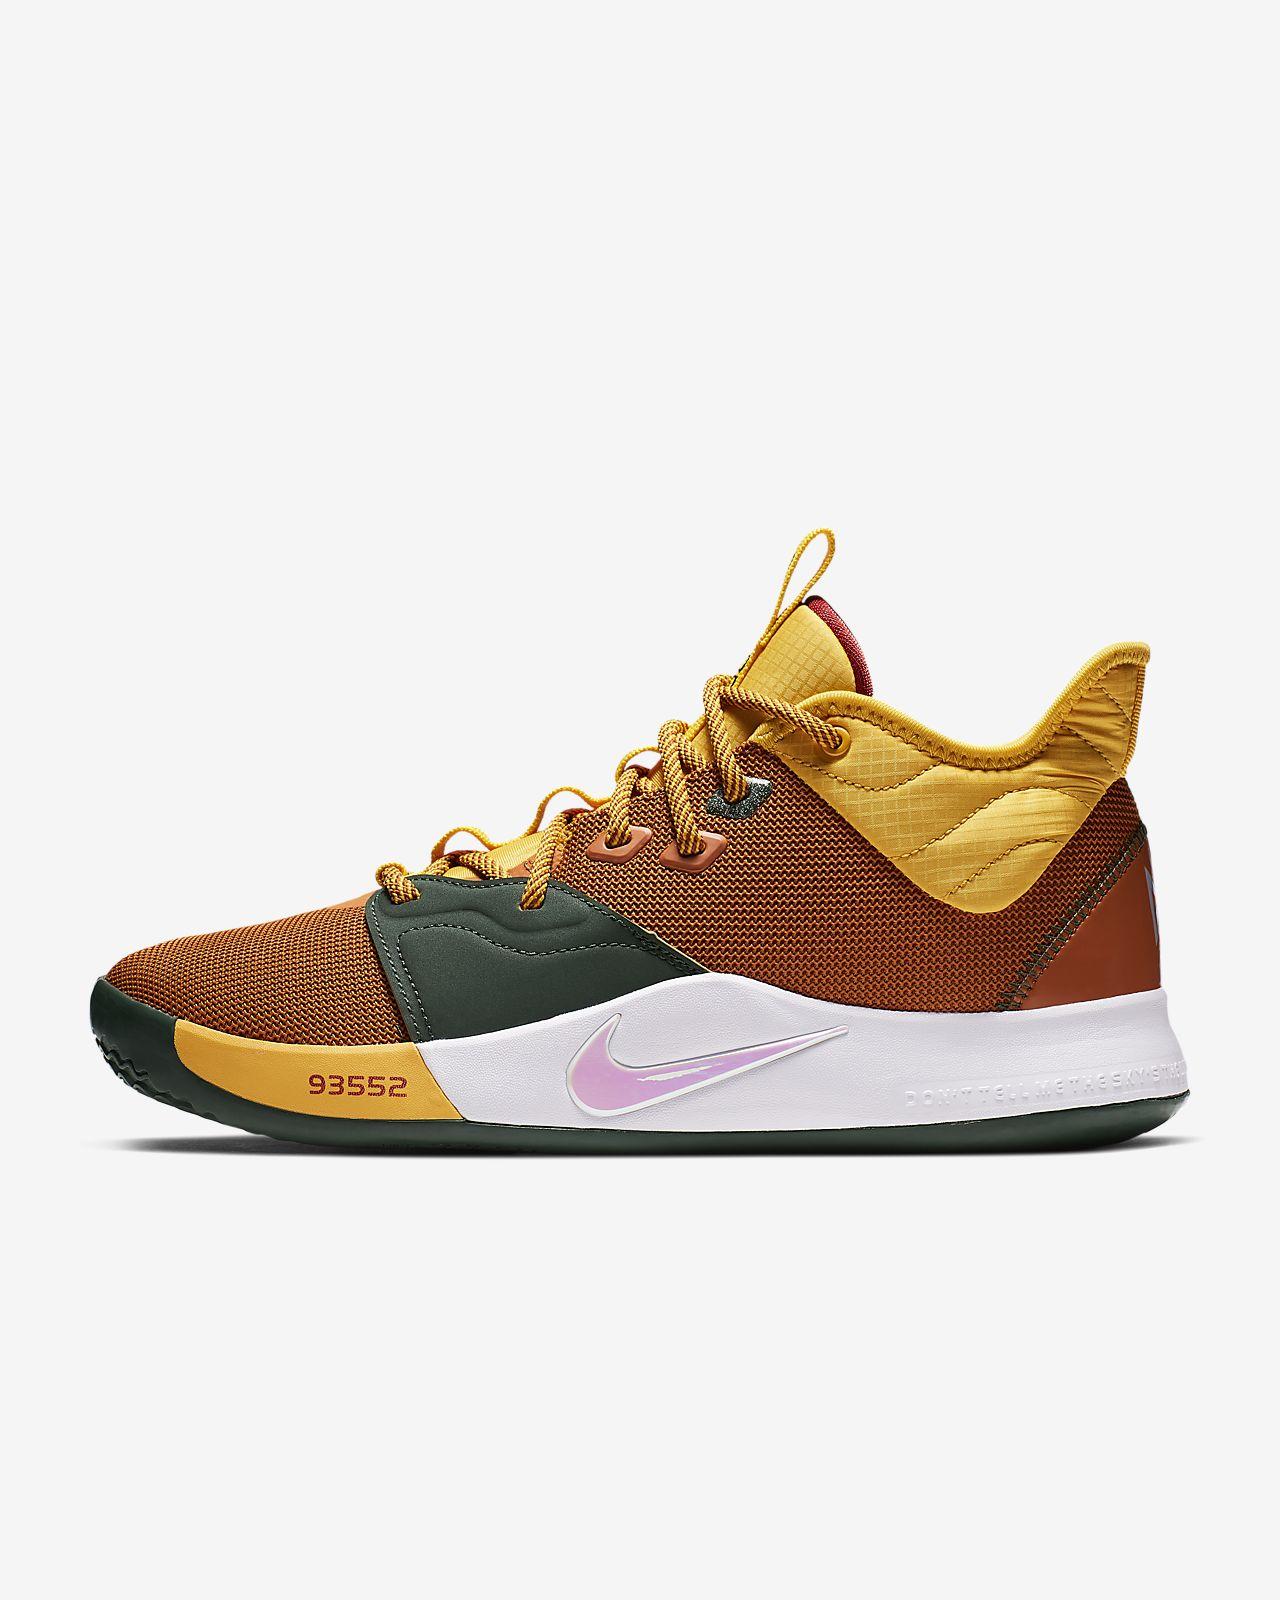 7995856ad4 pg-3-all-star-basketball-shoe-K0T50X.jpg